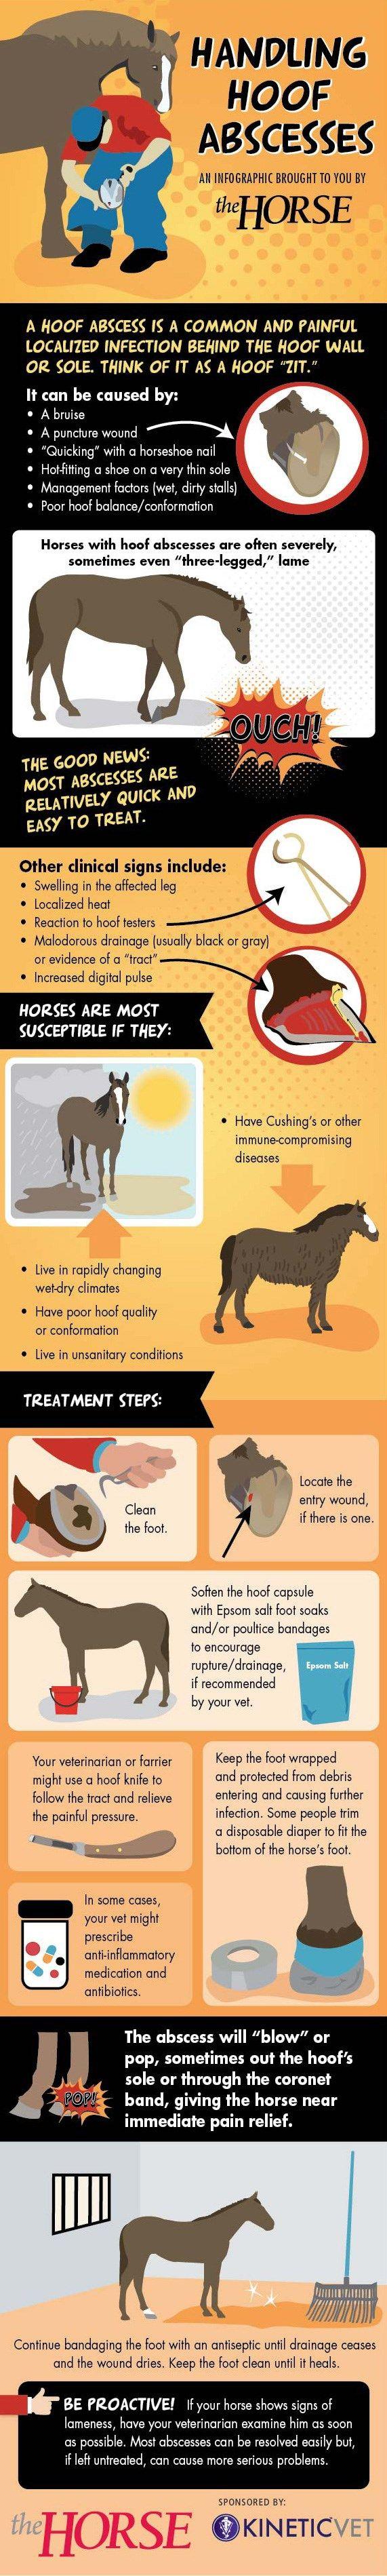 Infographic: Handling Hoof Abscesses | TheHorse.com